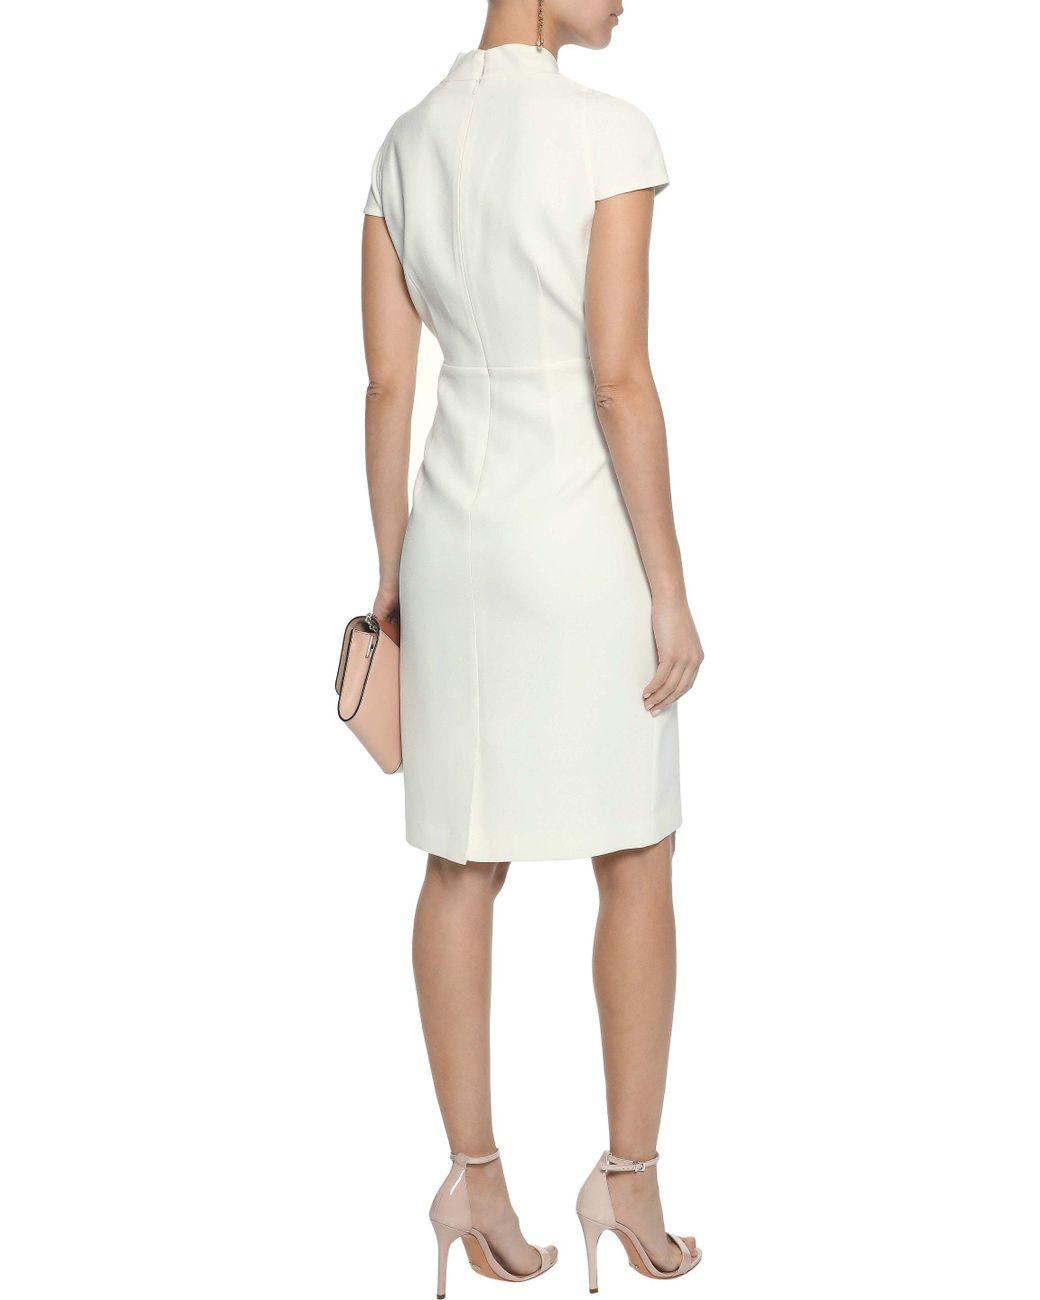 6f5efe45 Elie Tahari Woman Gerarda Pleated Crepe Dress Ivory in White - Lyst